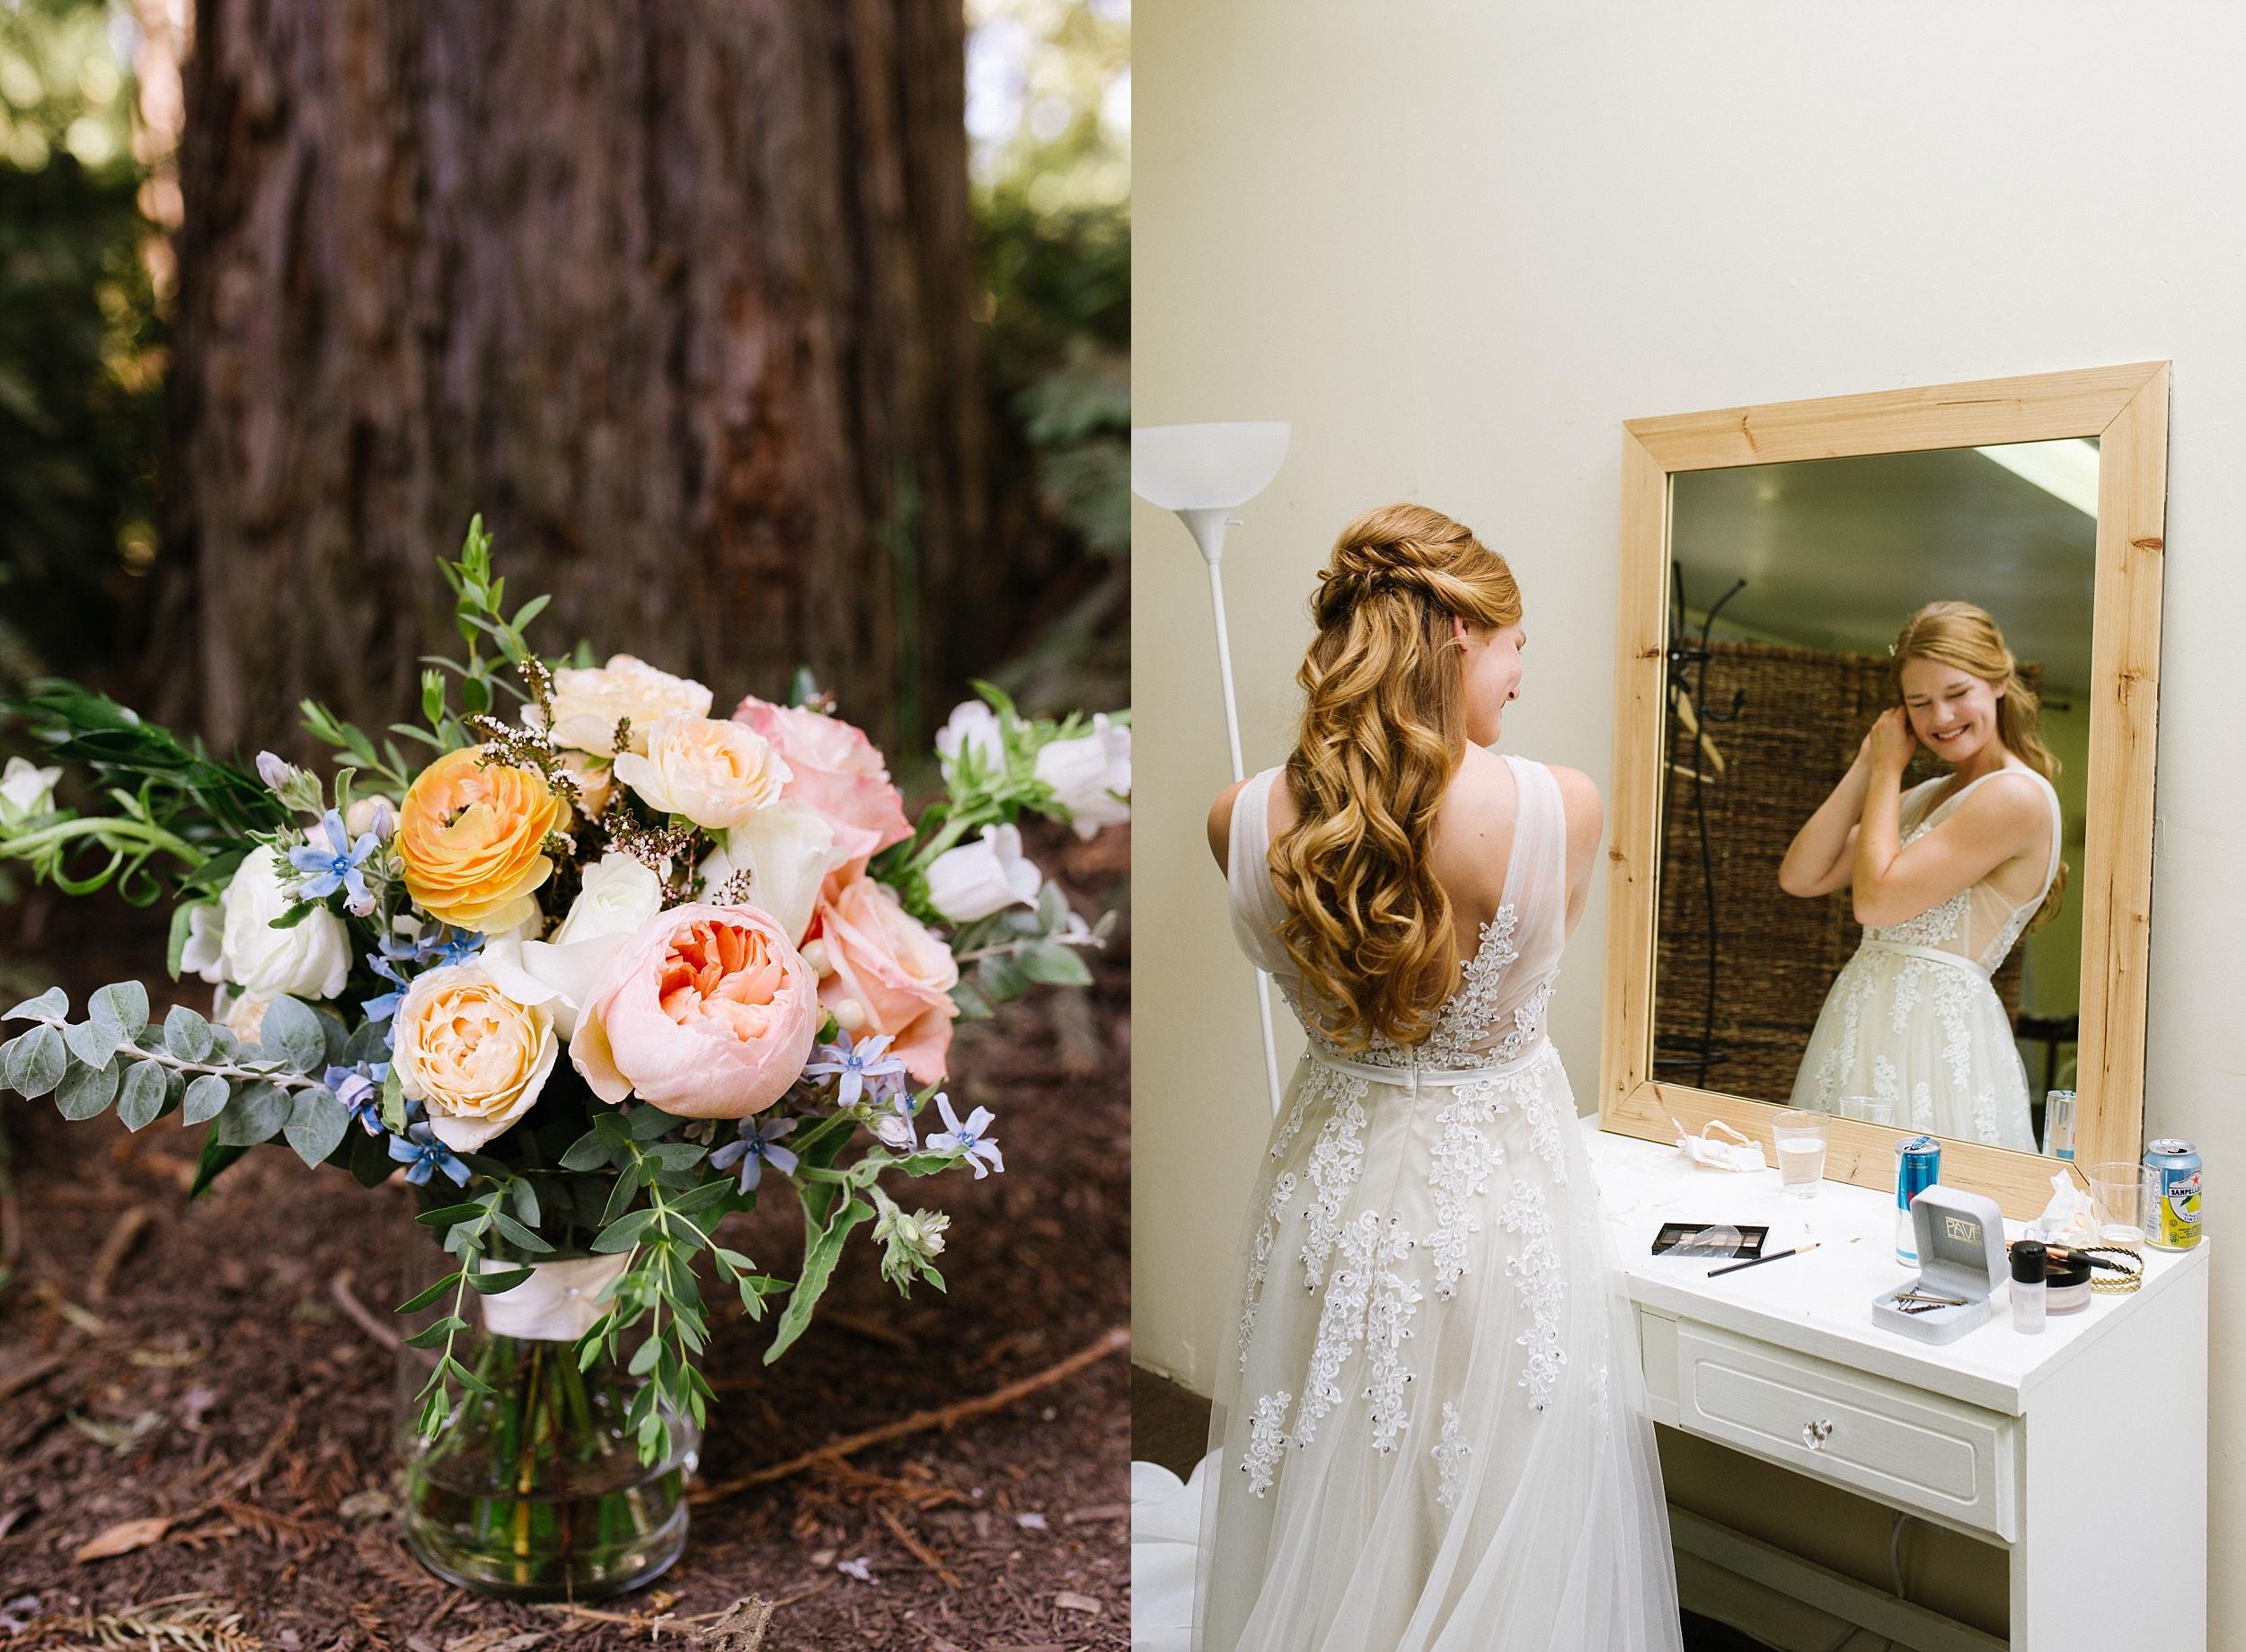 Amphitheatre-of-the-Redwoods-wedding-erikariley_chelsea-dier-photography_0005.jpg